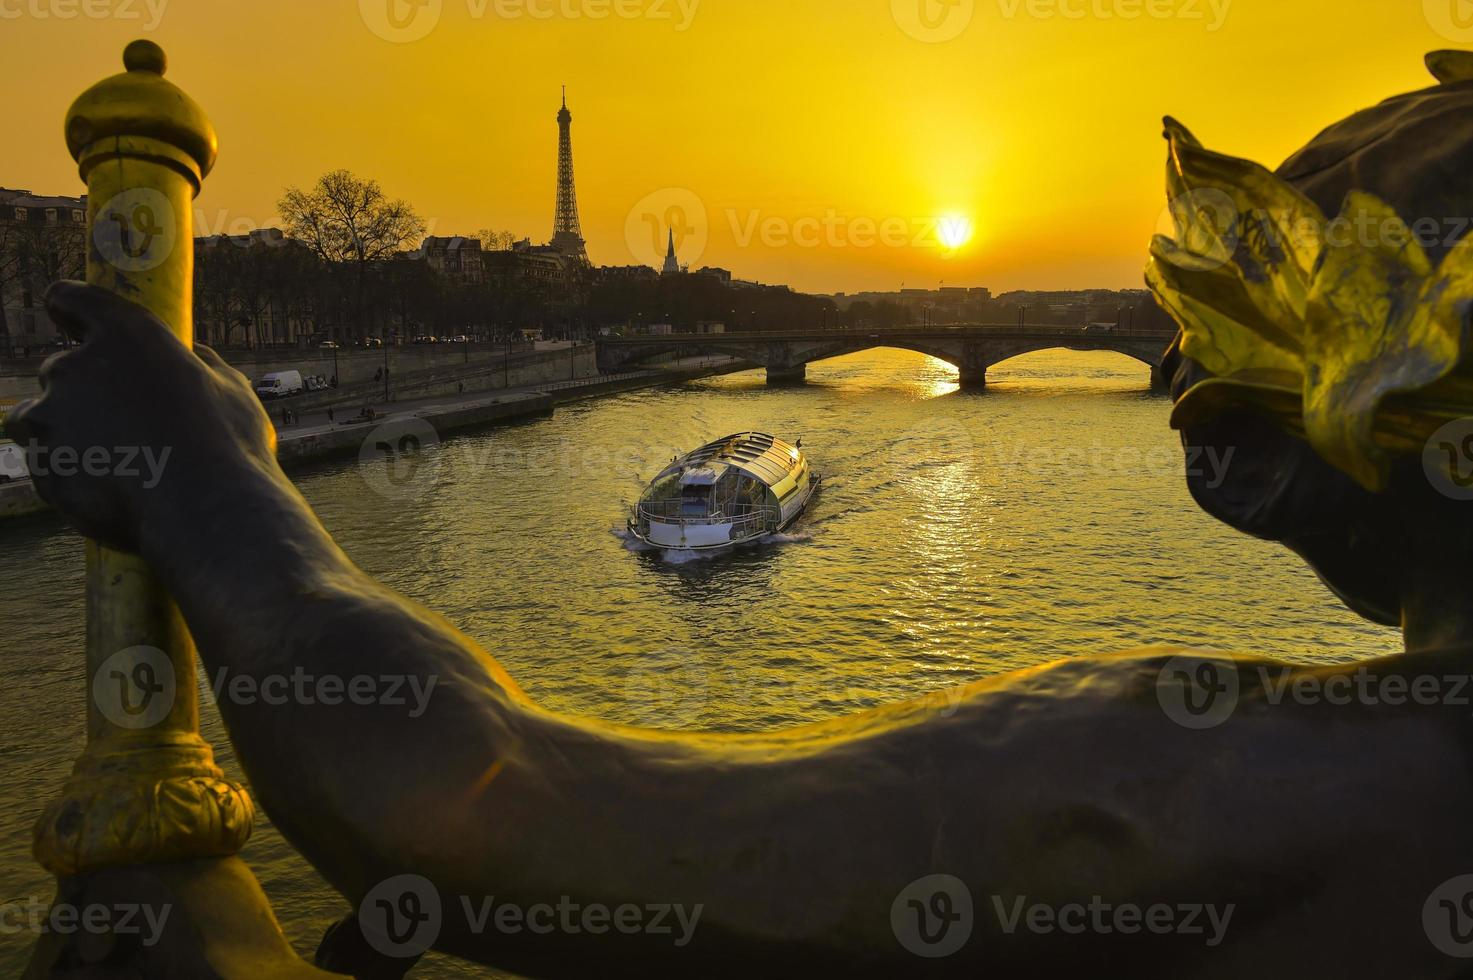 parijs bij nachttour eiffel pont alexandre iii brug foto